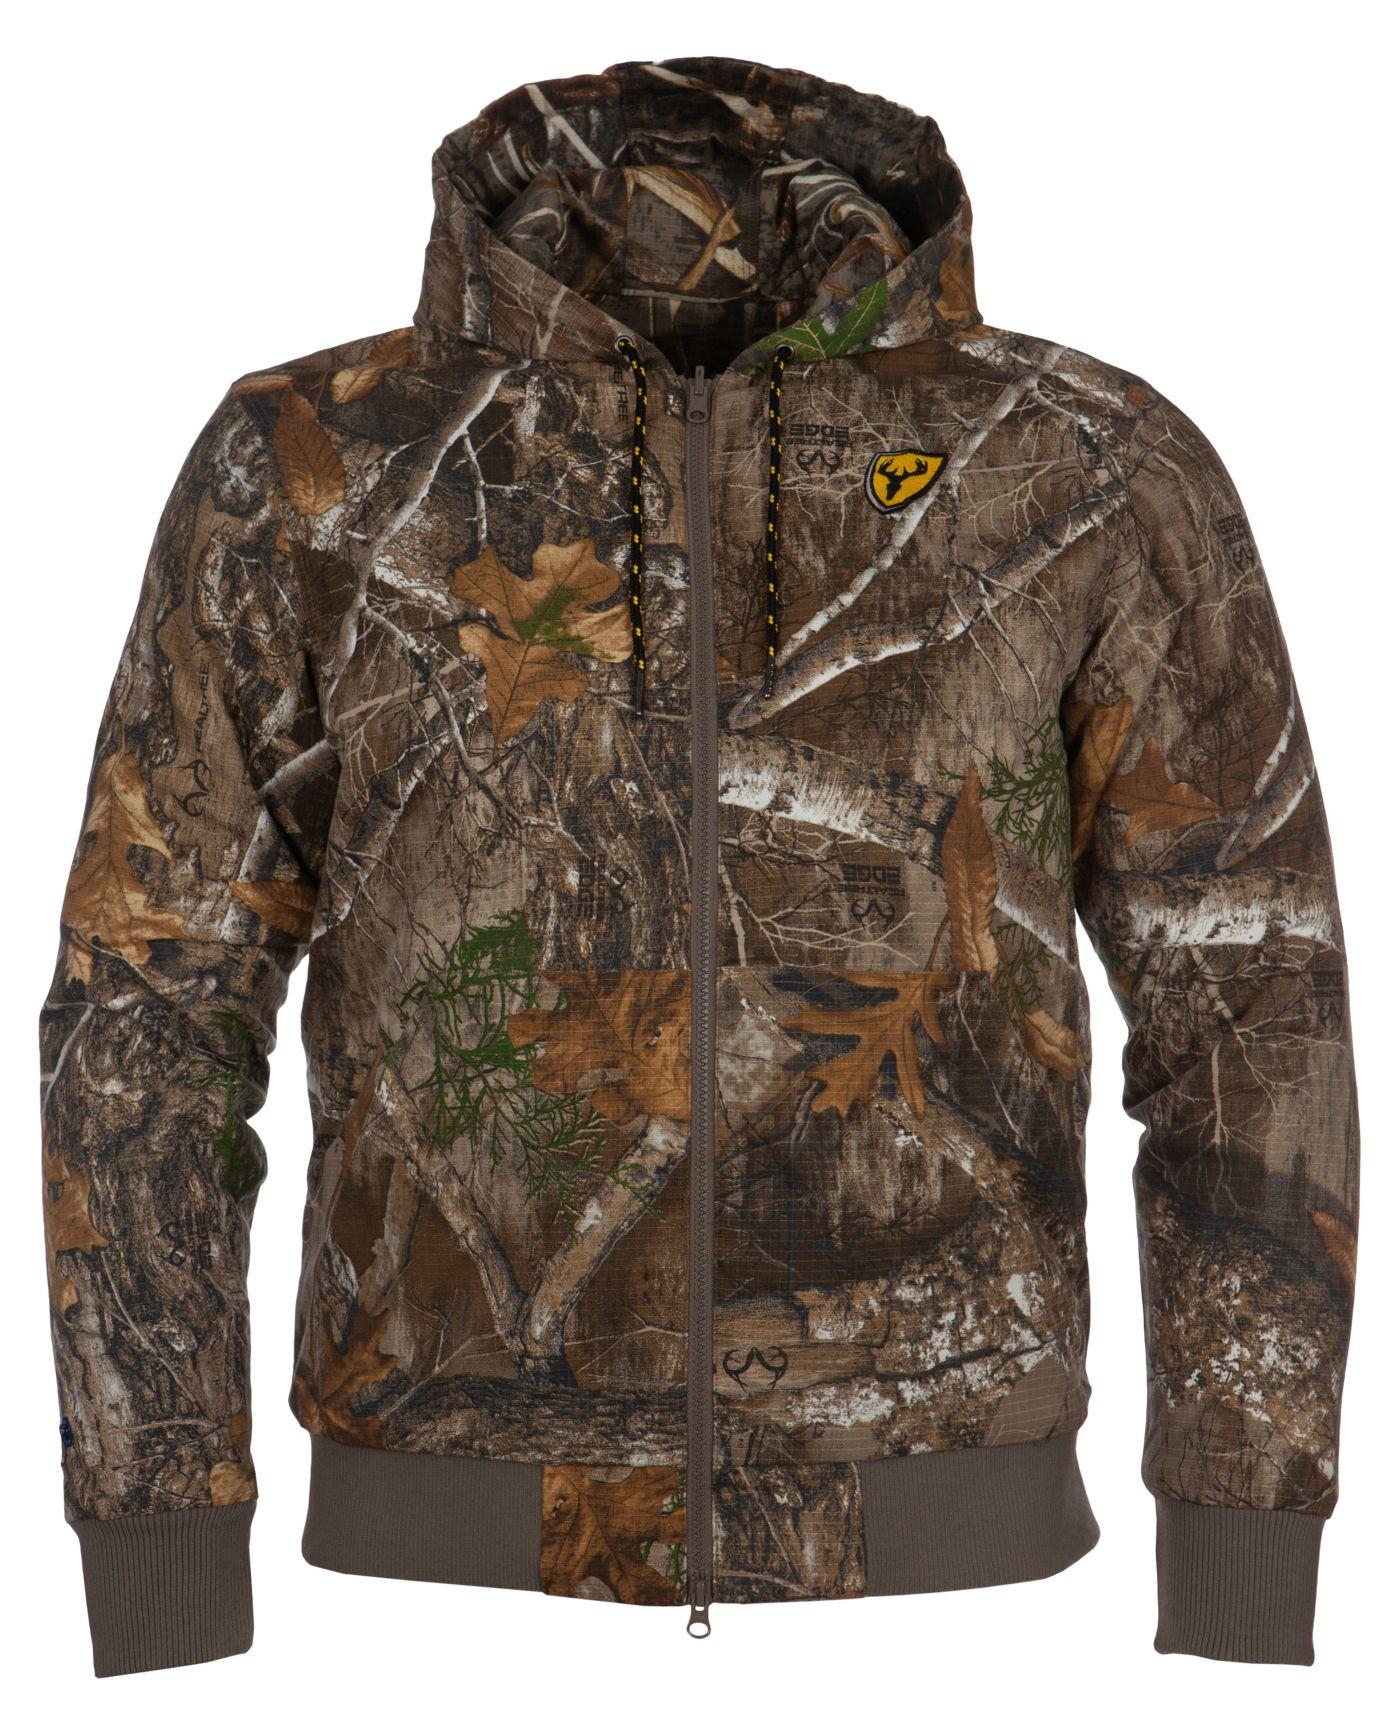 Blocker Outdoors Men's Evolve Reversible Jacket